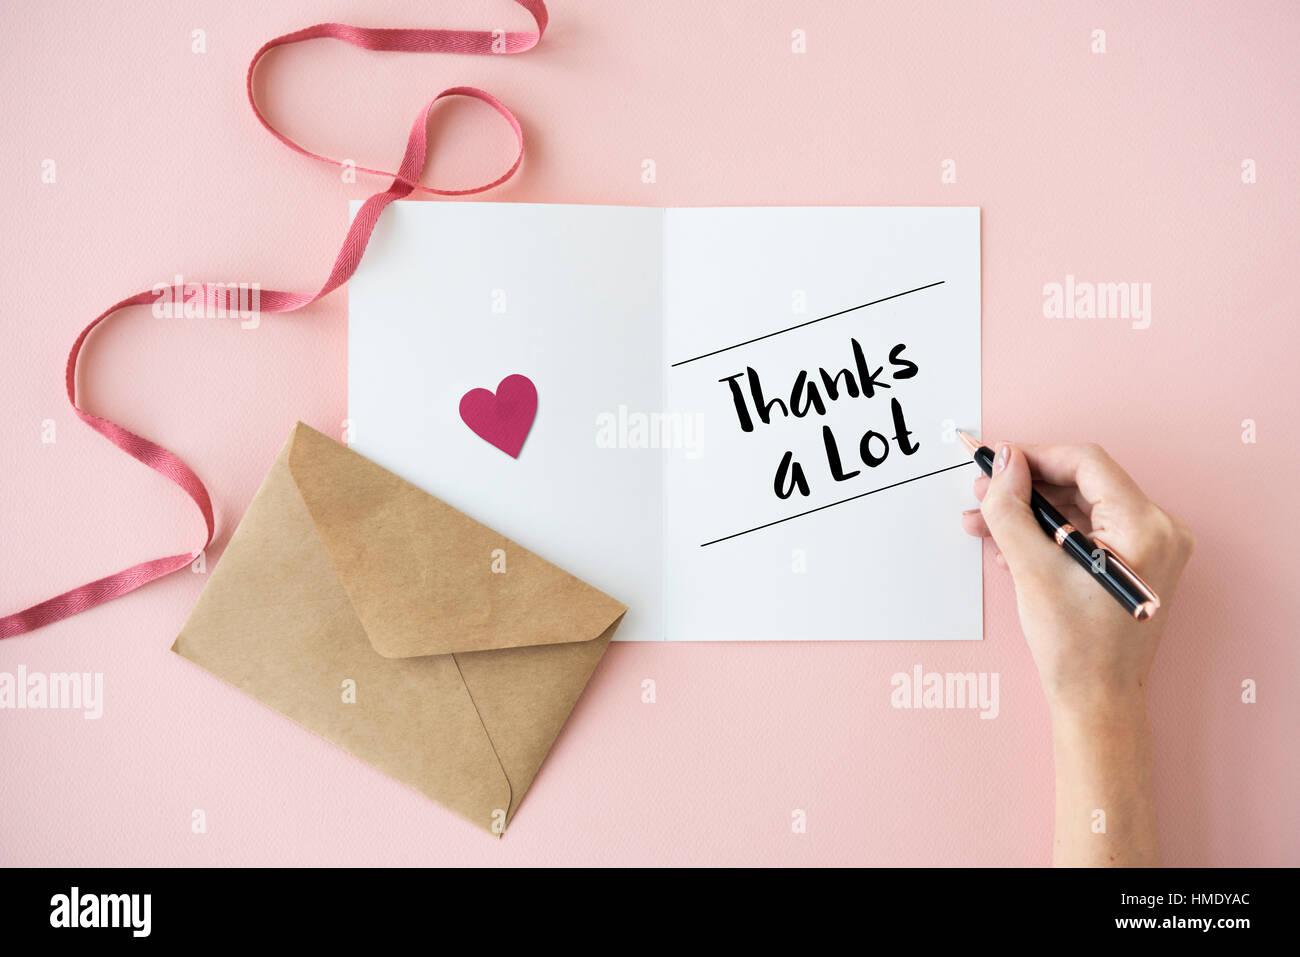 Thank Appreciation Grateful Thankful Concept - Stock Image